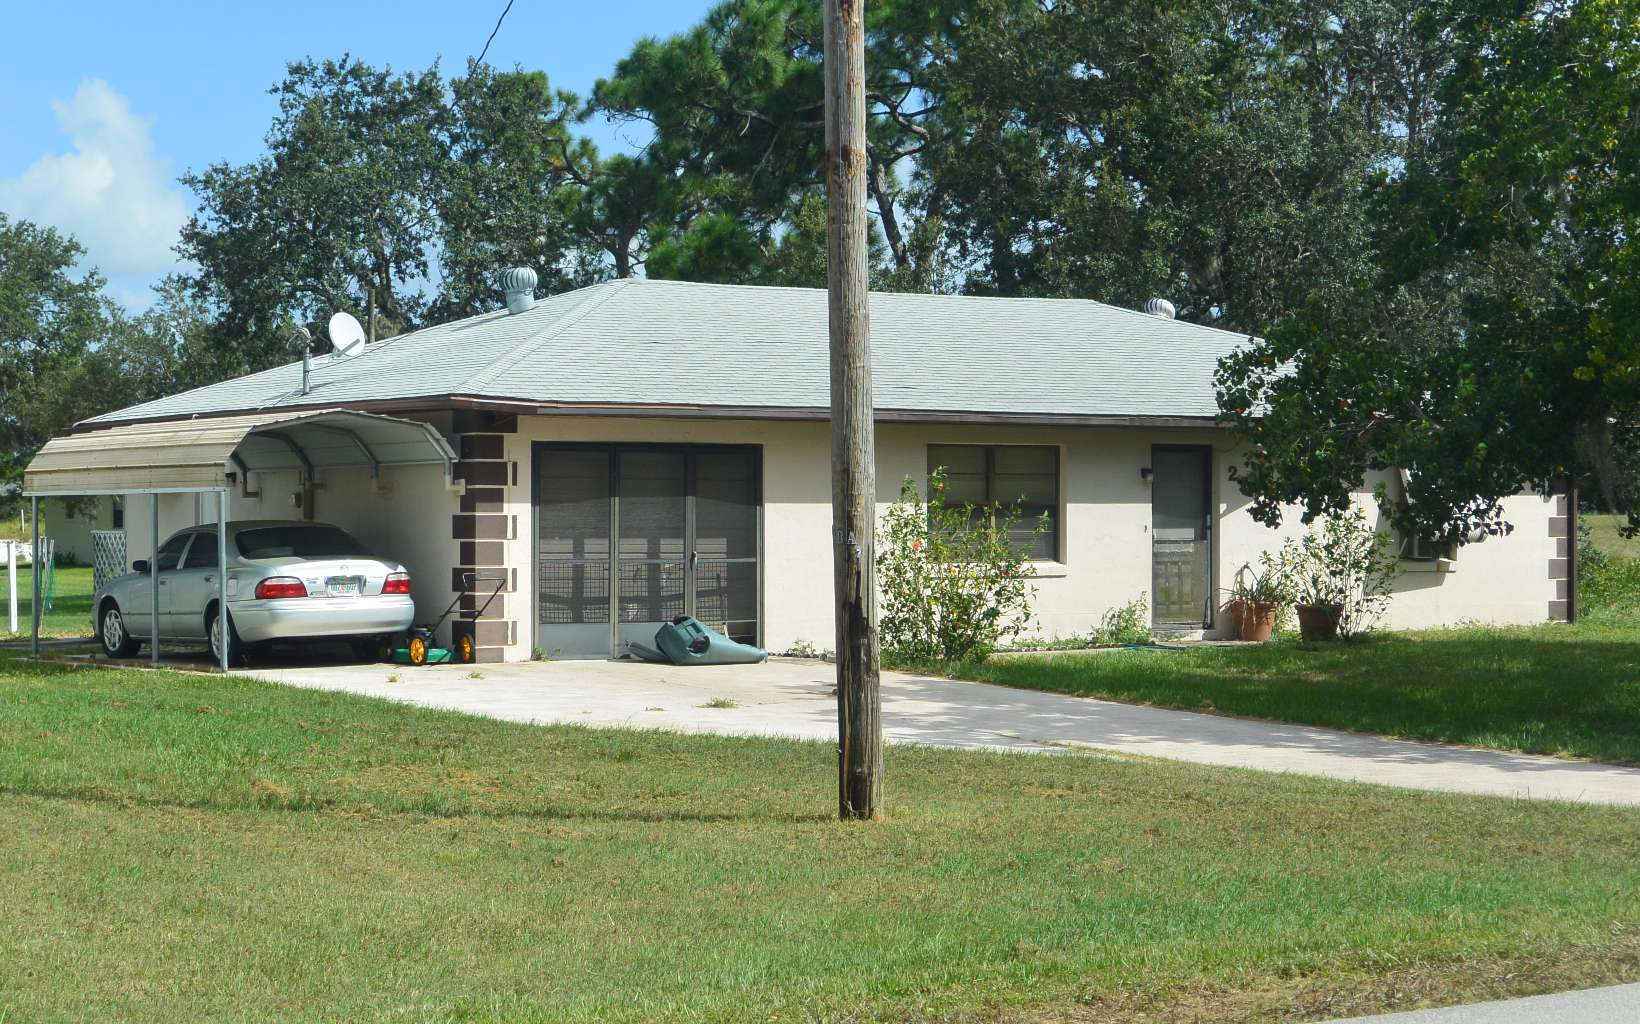 257 Washington Blvd, Lake Placid, FL 33852